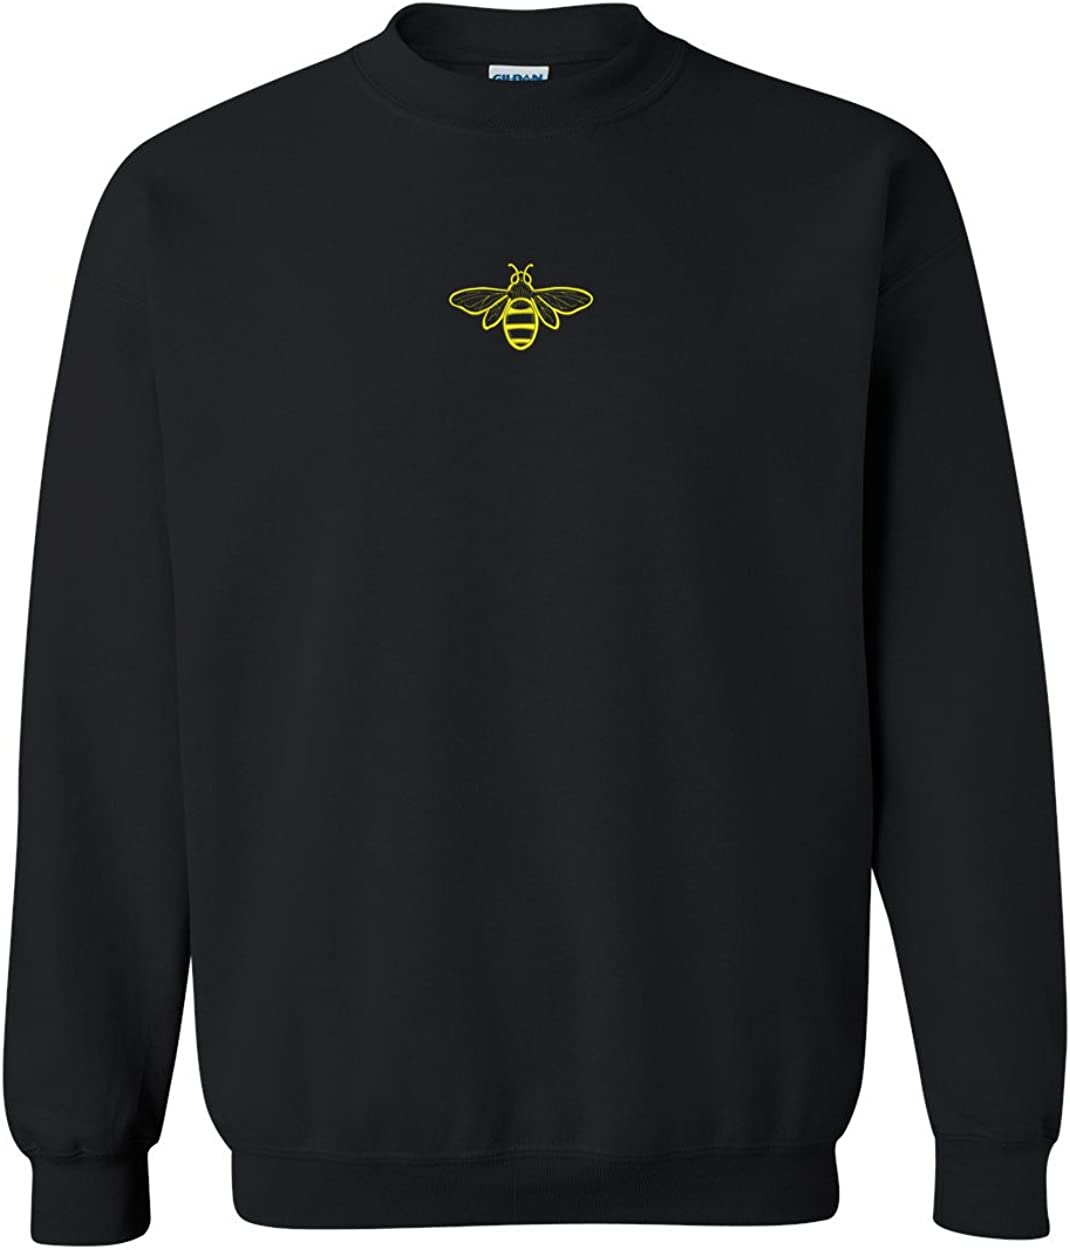 Trendy Apparel Shop Bee Embroidered Crewneck Sweatshirt